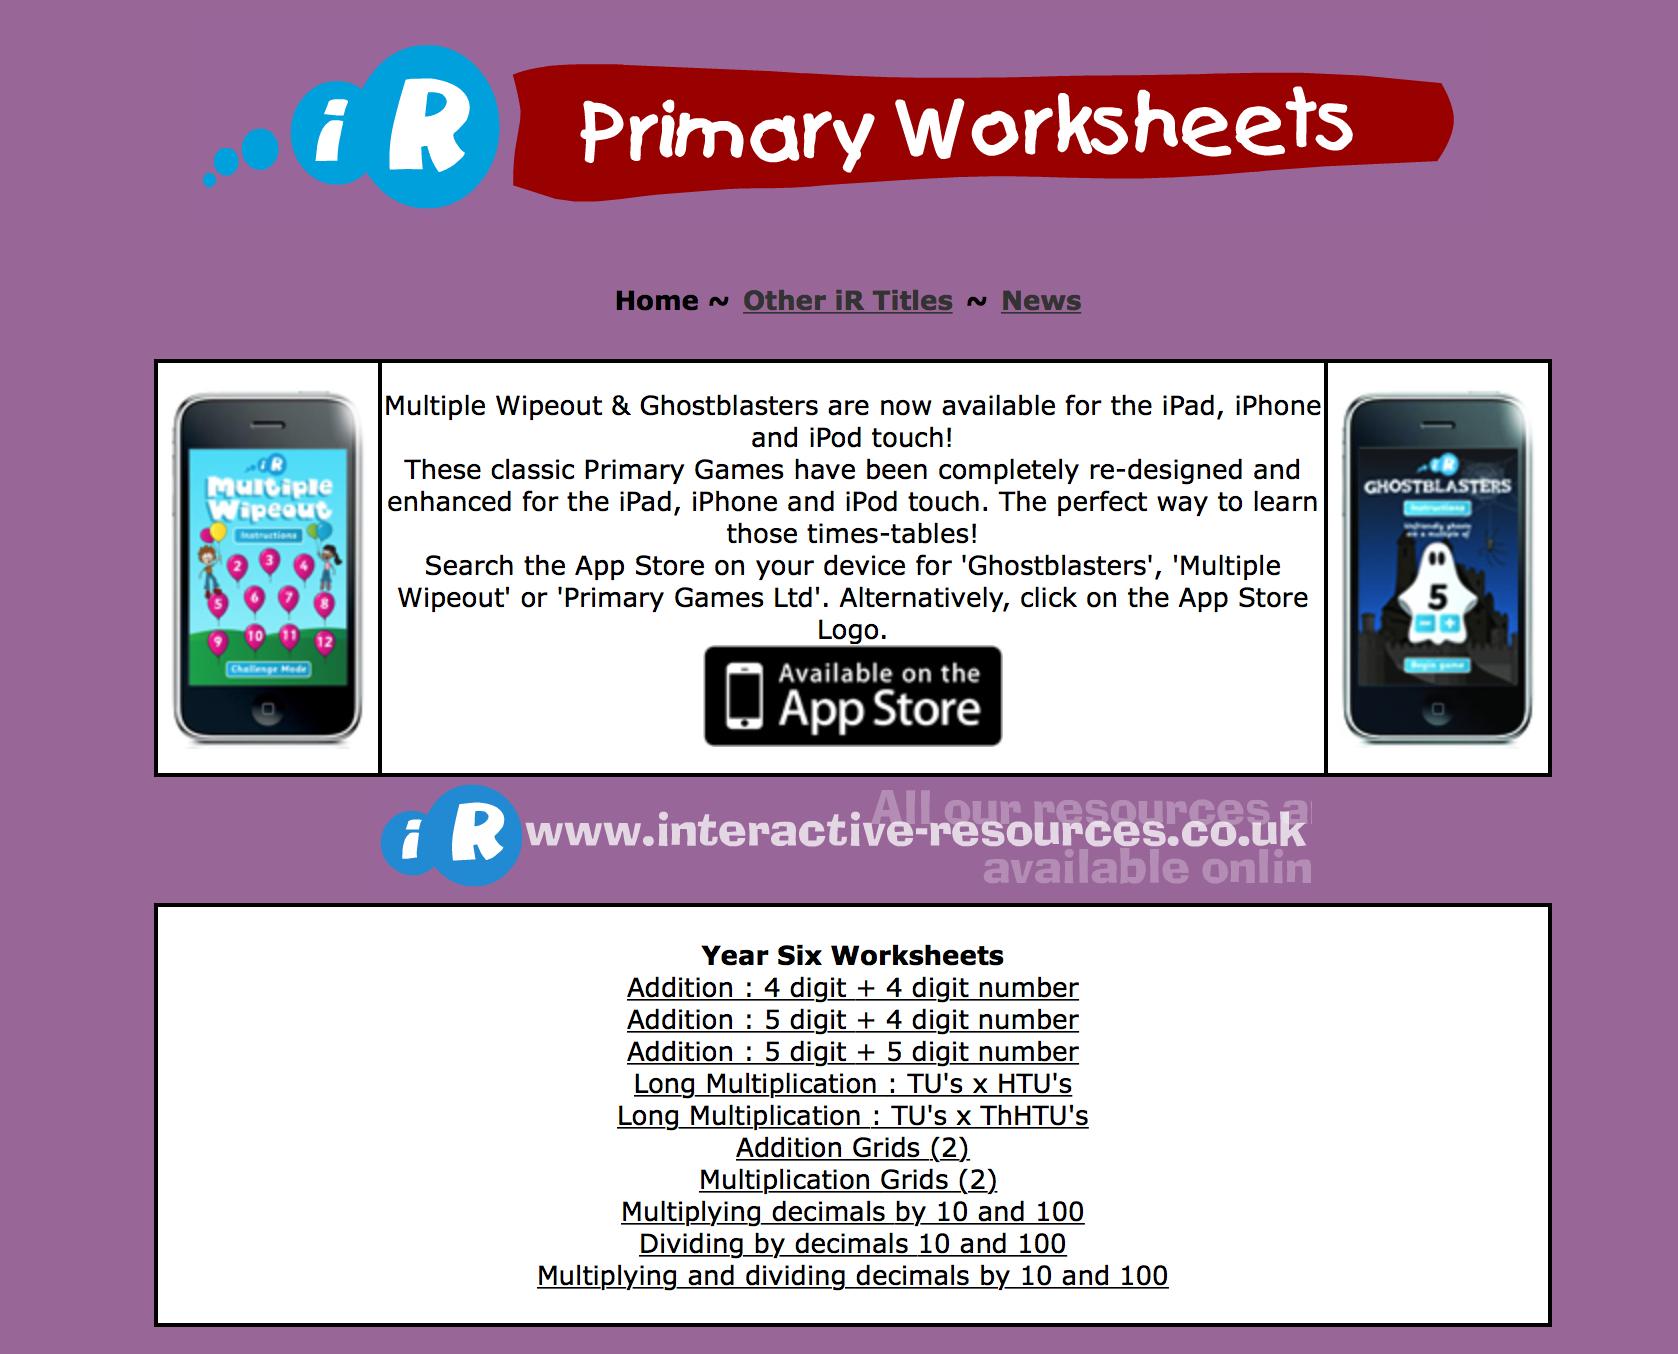 Primary Worksheets - Maths   E-Learning: Mathematics   Pinterest ...